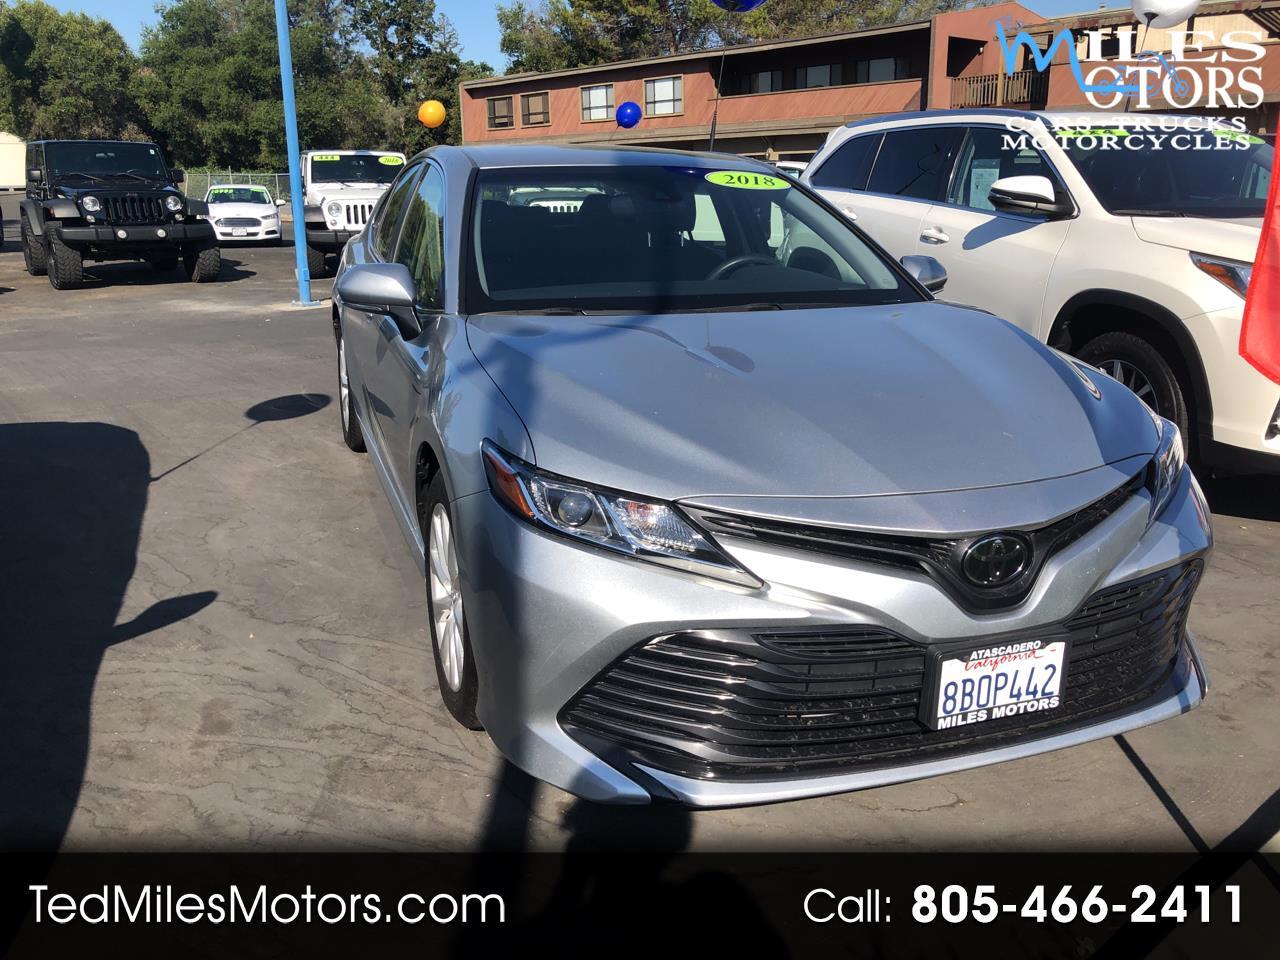 Toyota Camry 2014.5 4dr Sdn I4 Auto LE (Natl) 2018